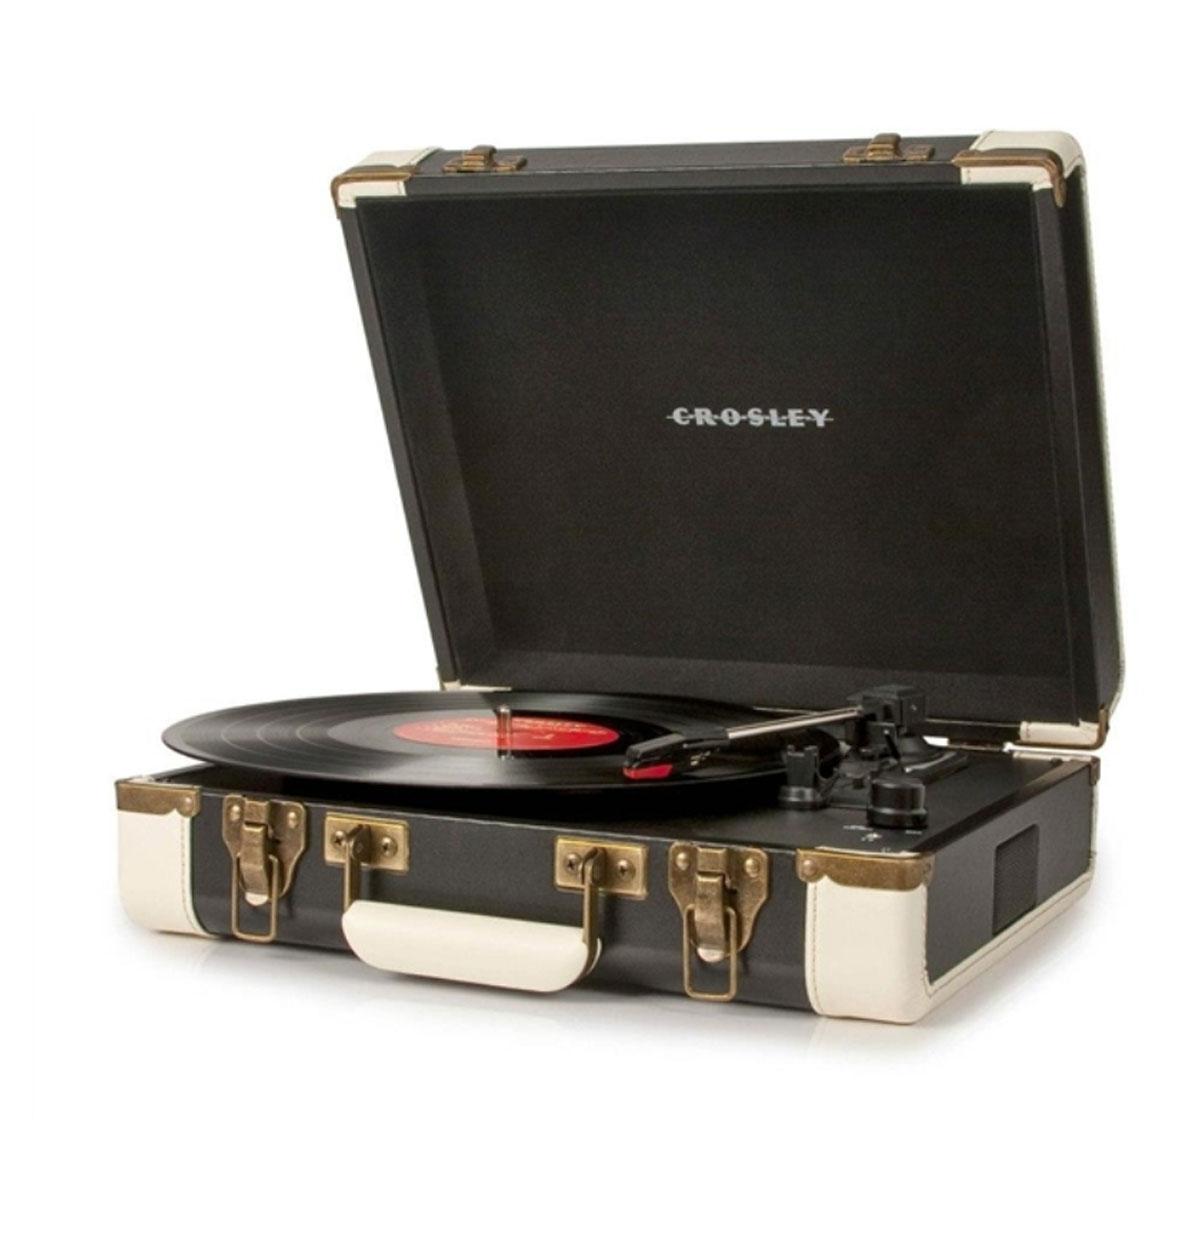 Crosley Executive Portable USB Turntable - Black/White